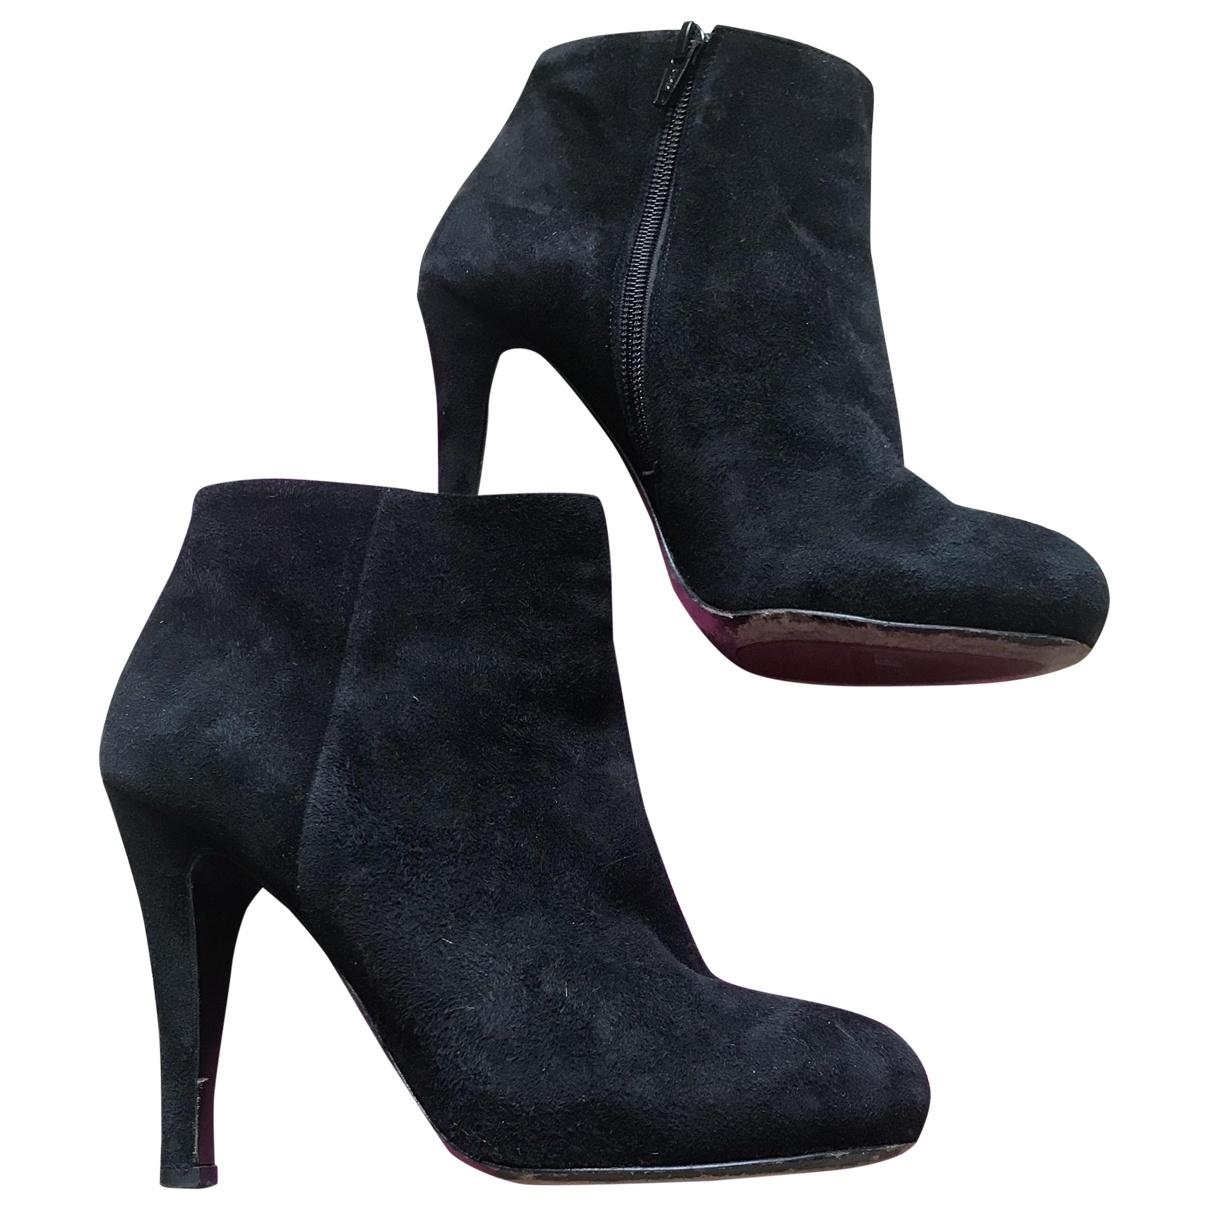 Jaime Mascaro \N Black Suede Ankle boots for Women 39 EU